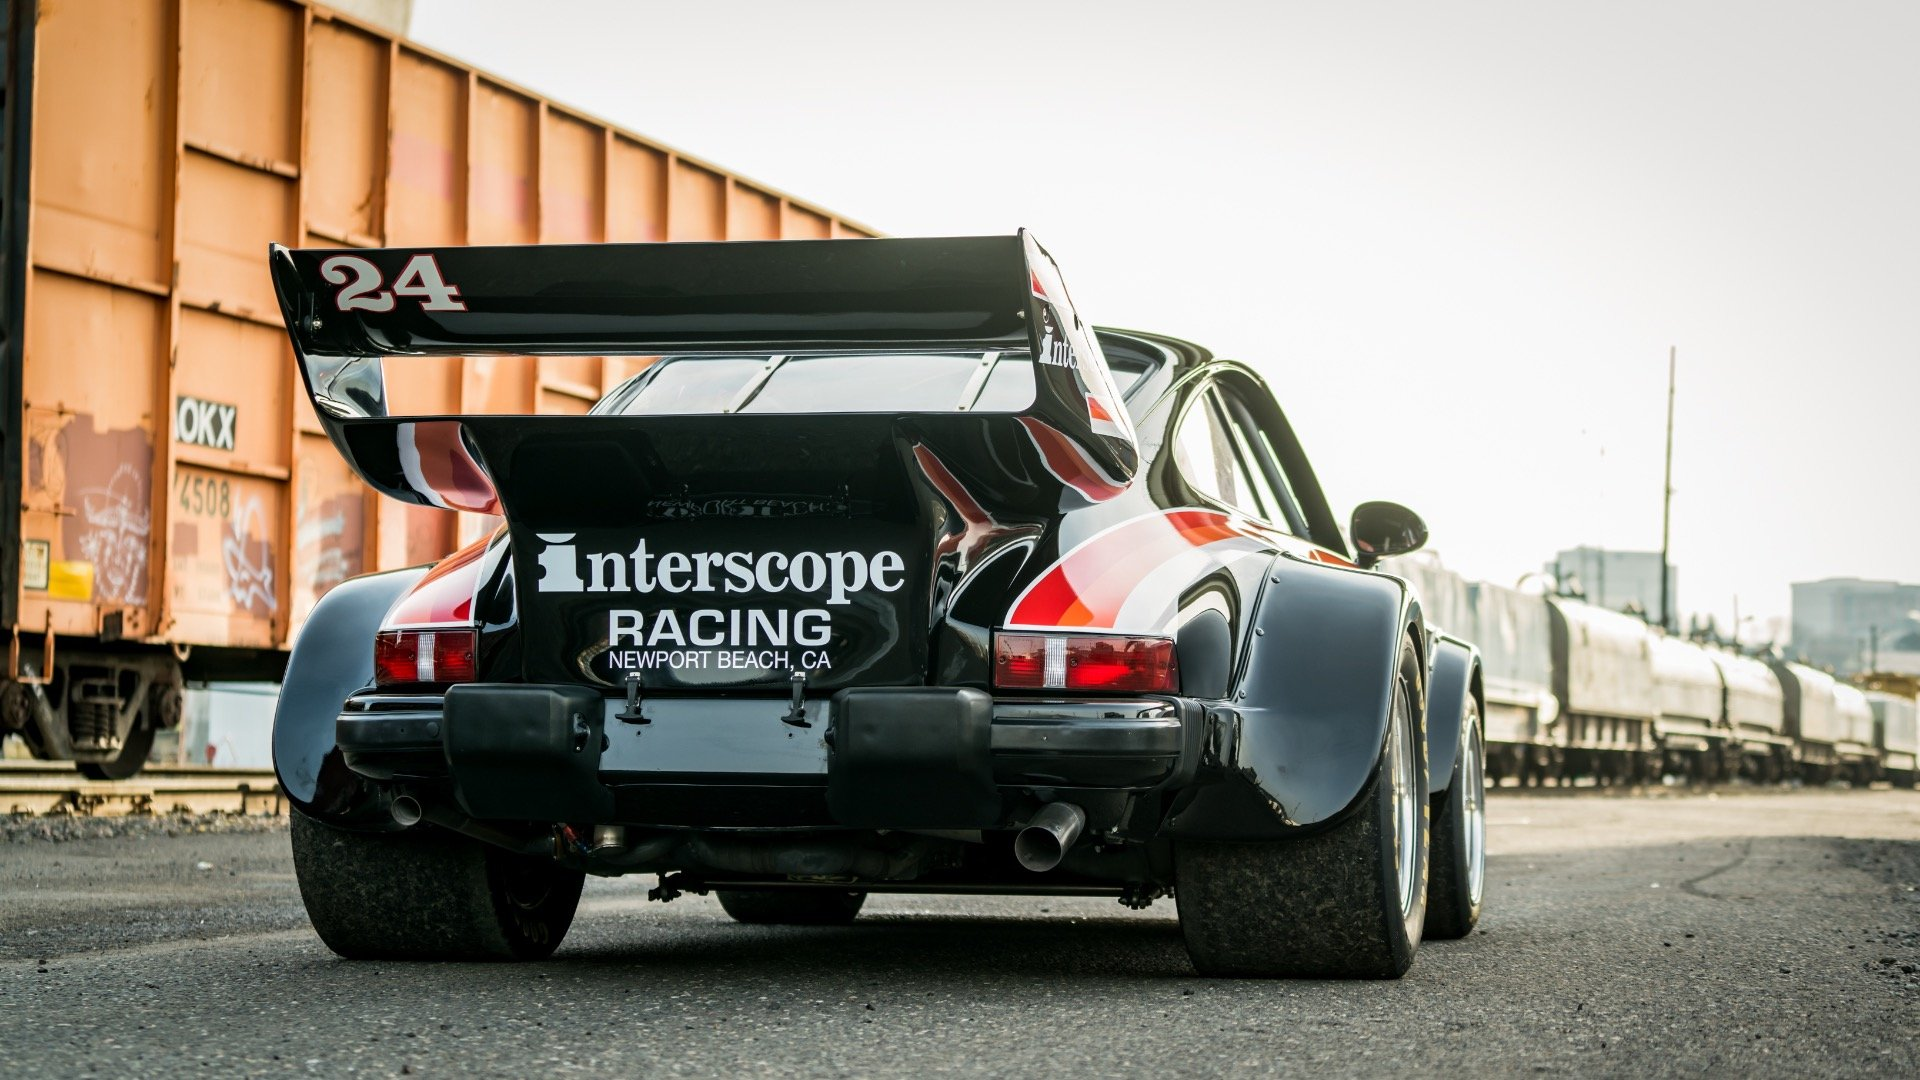 1986 Porsche Interscope 934.5 Race Car $127k spent  $159.9 For Sale (picture 3 of 6)